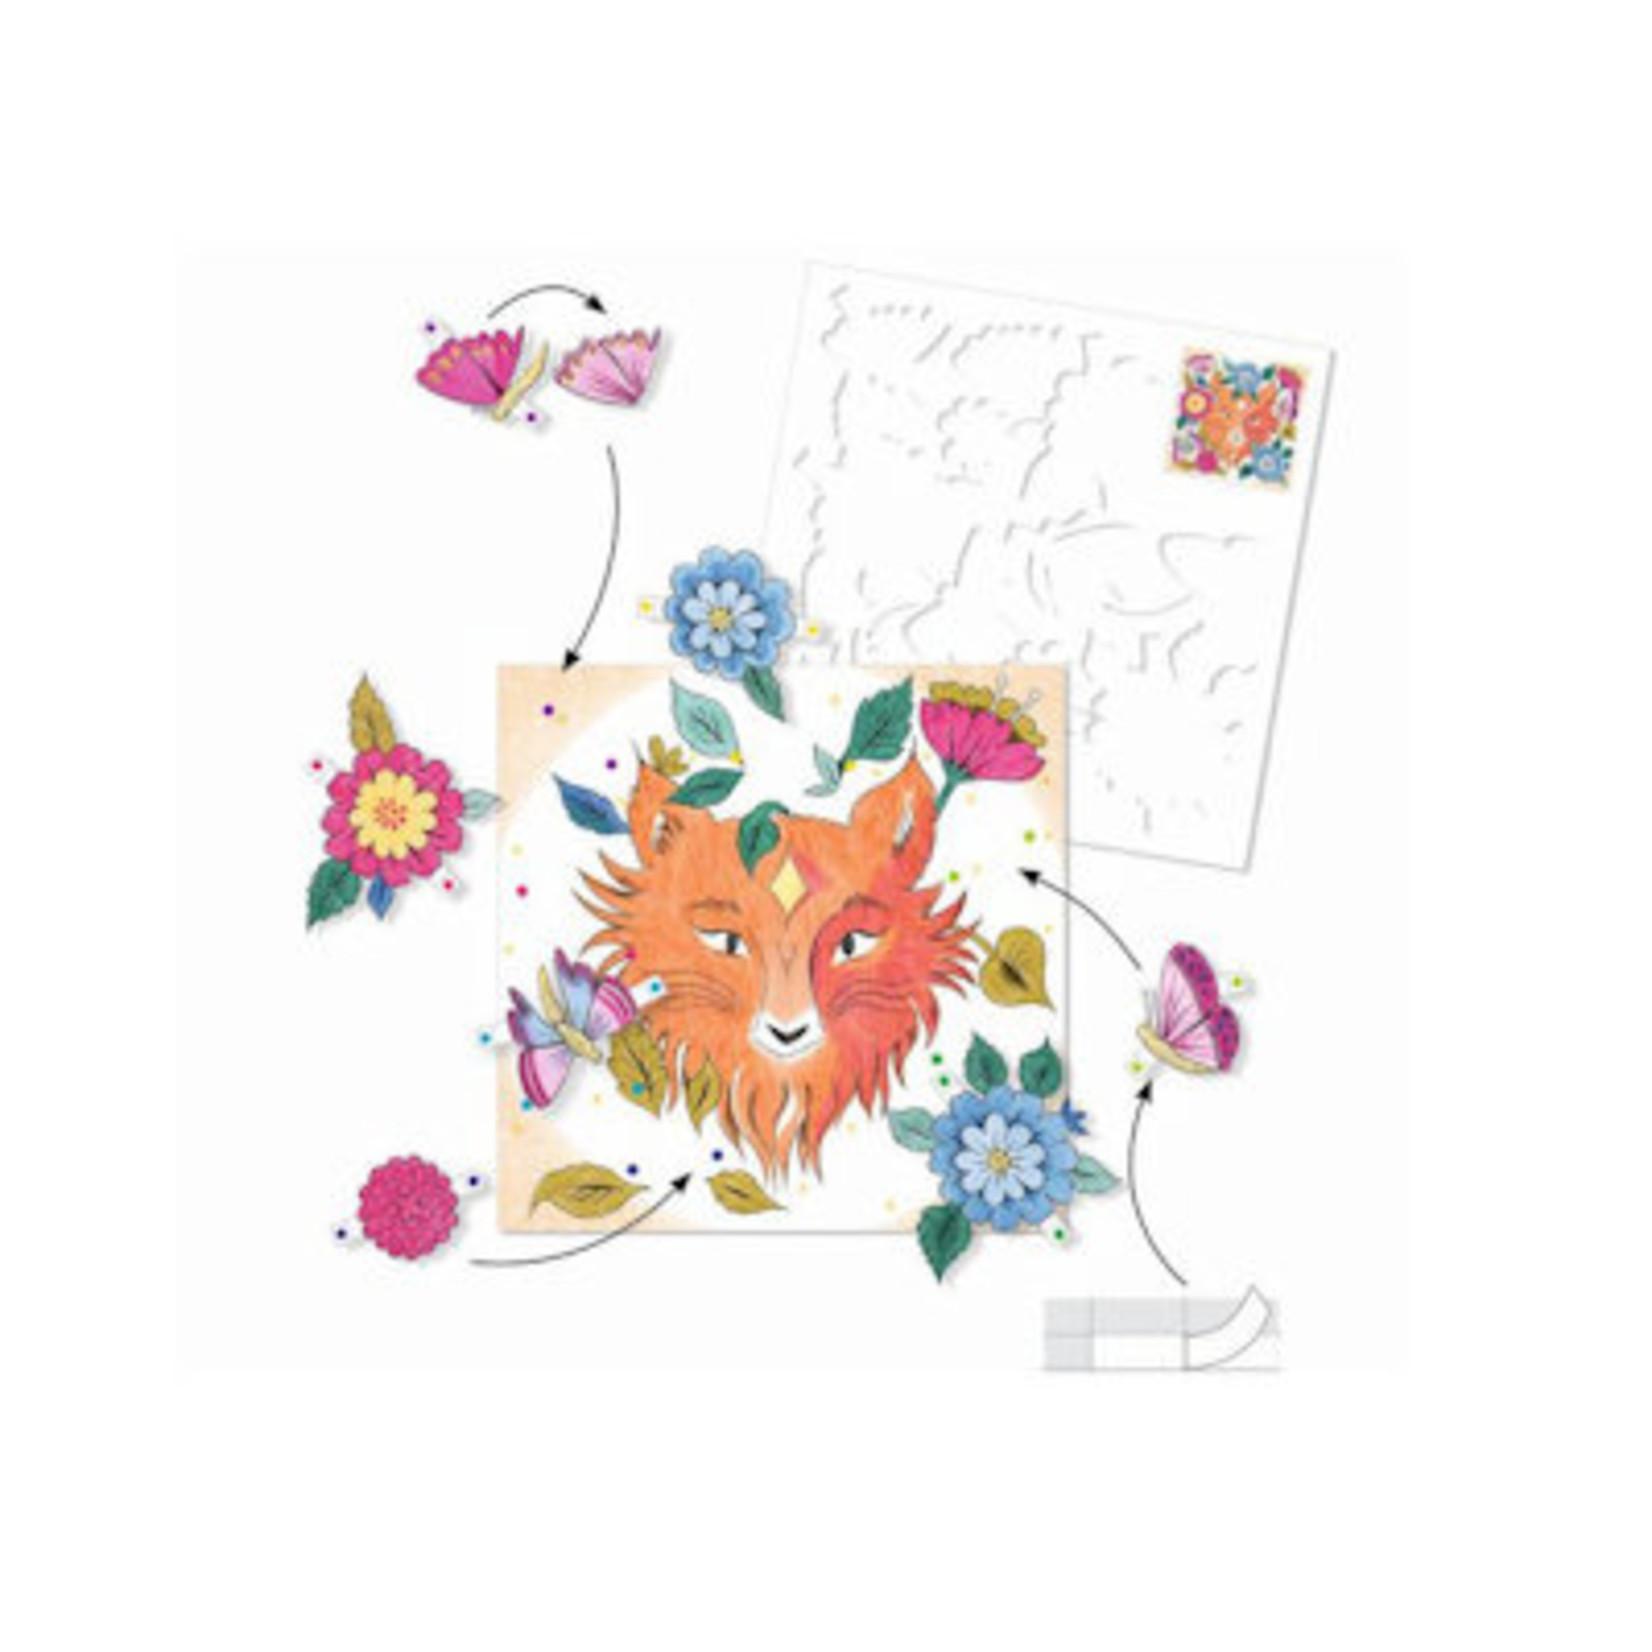 Djeco Verrassende kleurplaten - Bosvriendjes